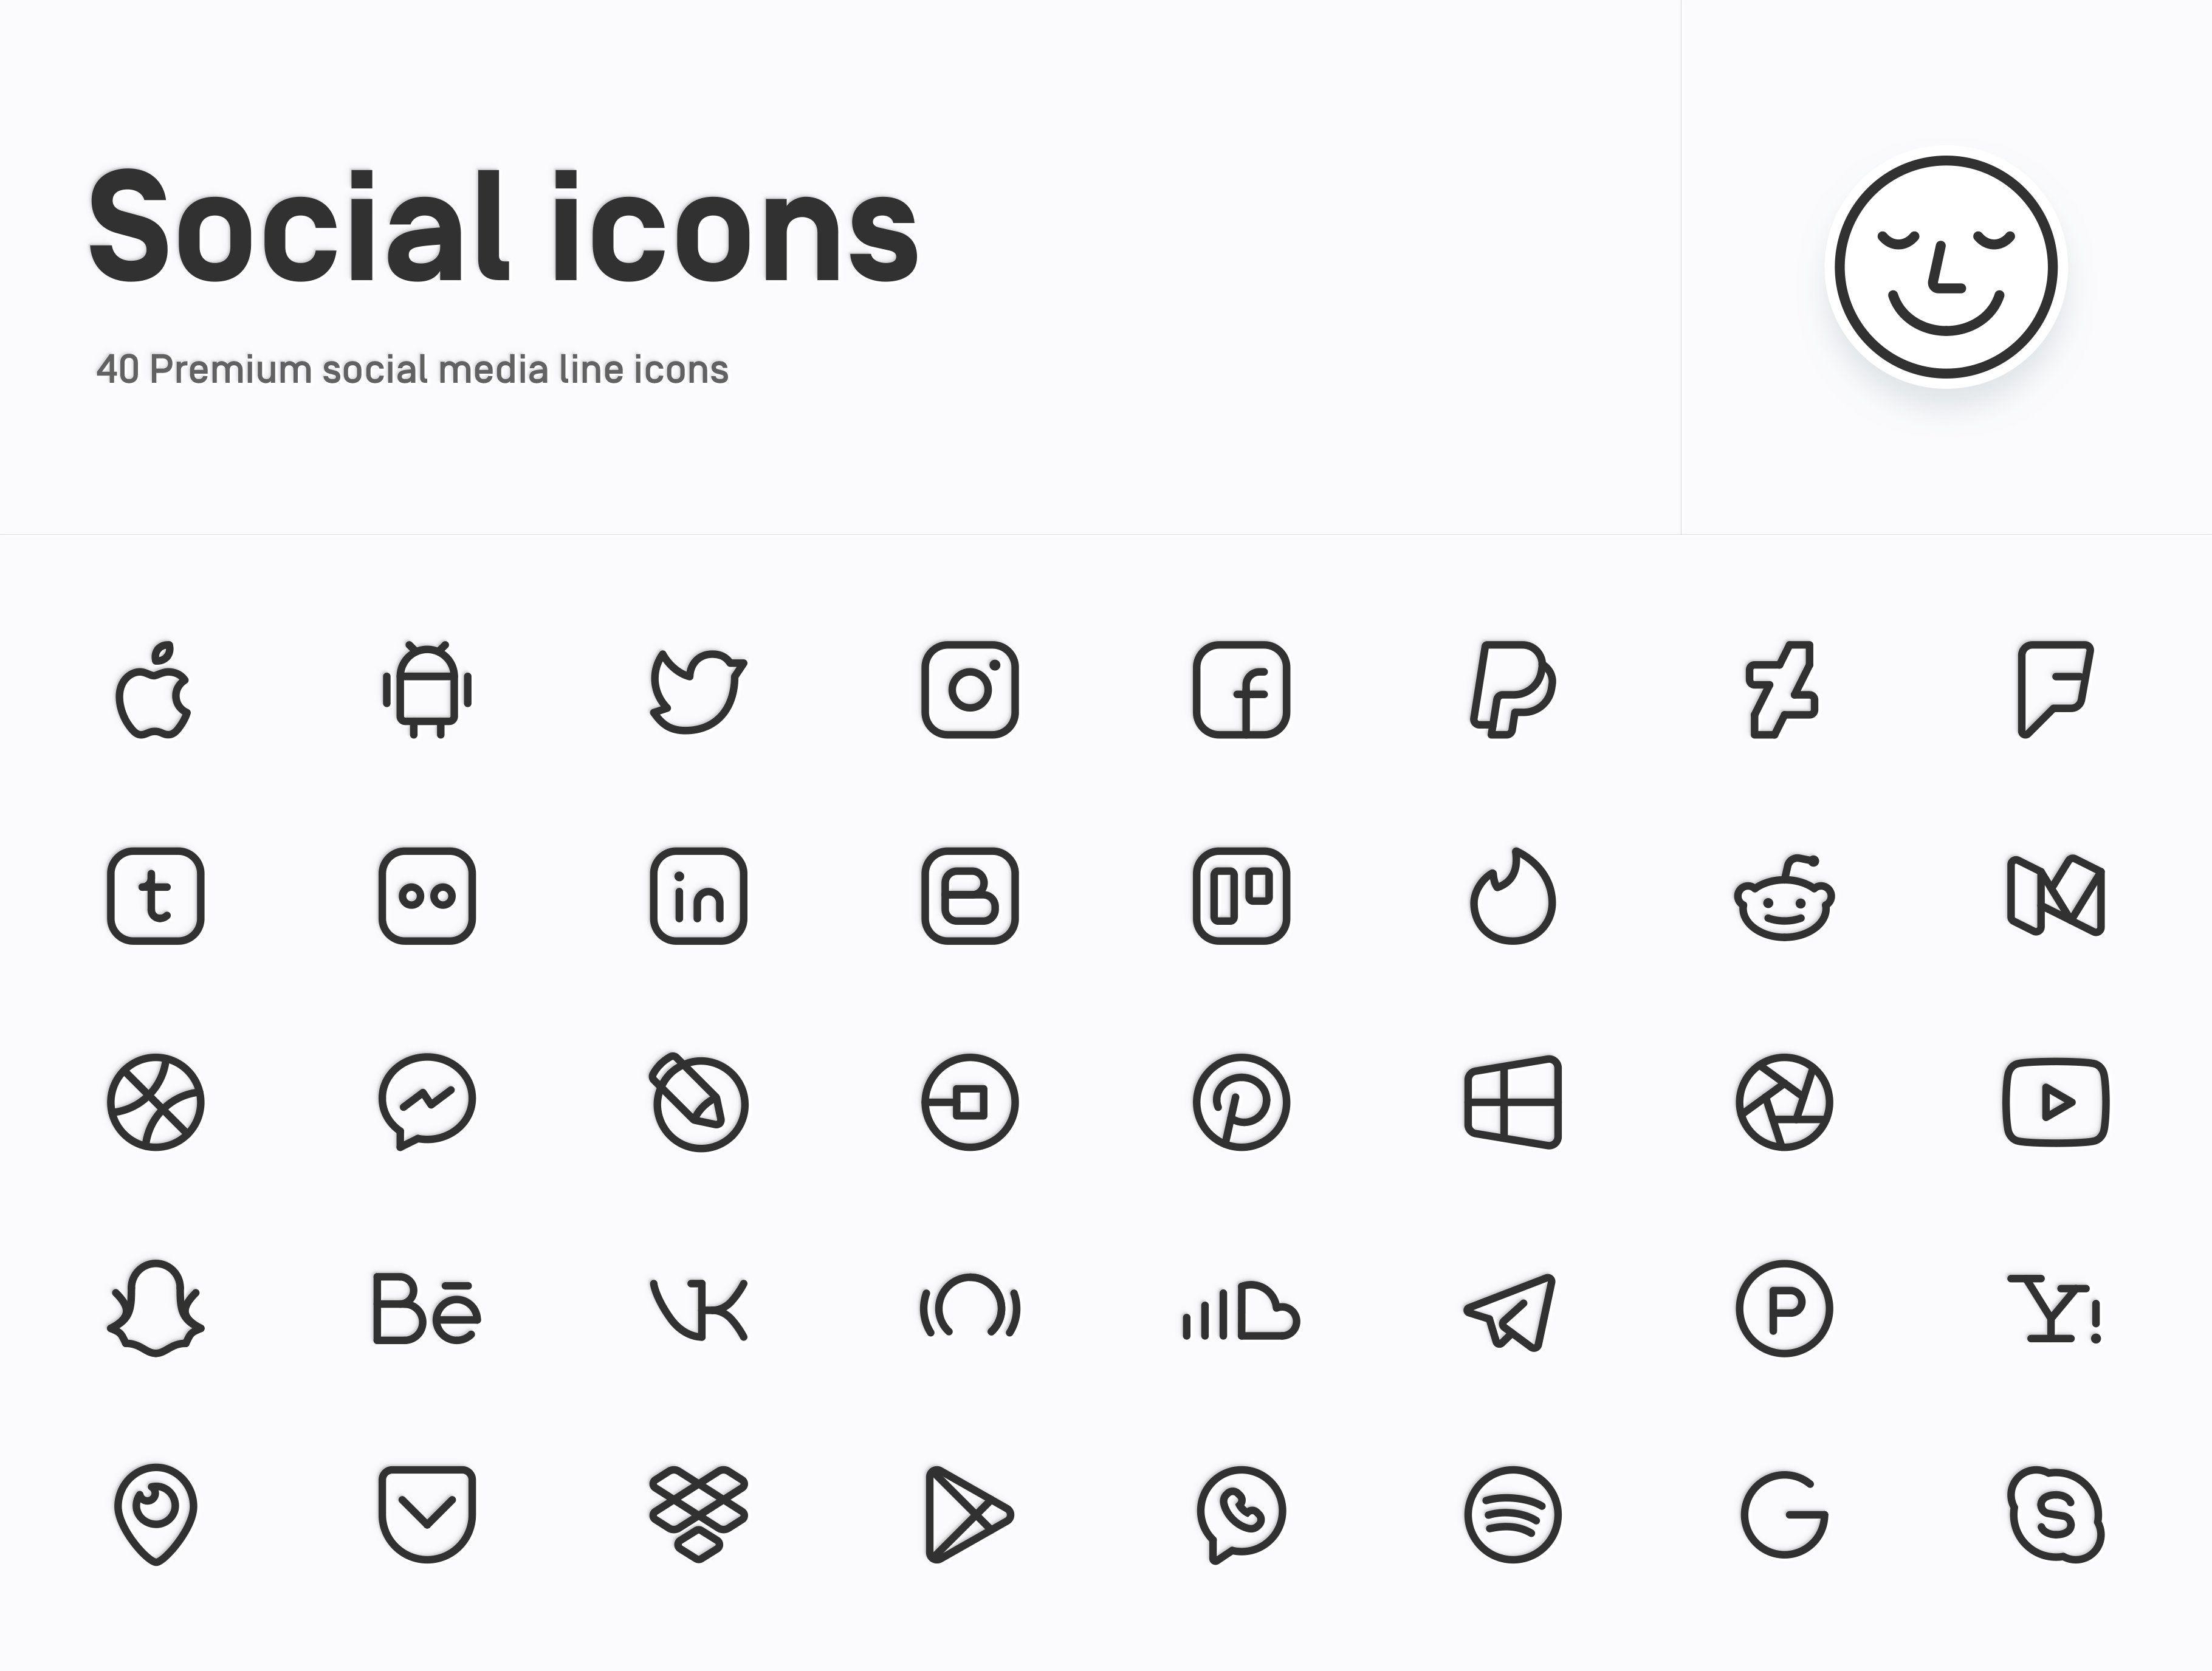 Premium Social Media Icons Social media icons, Iphone